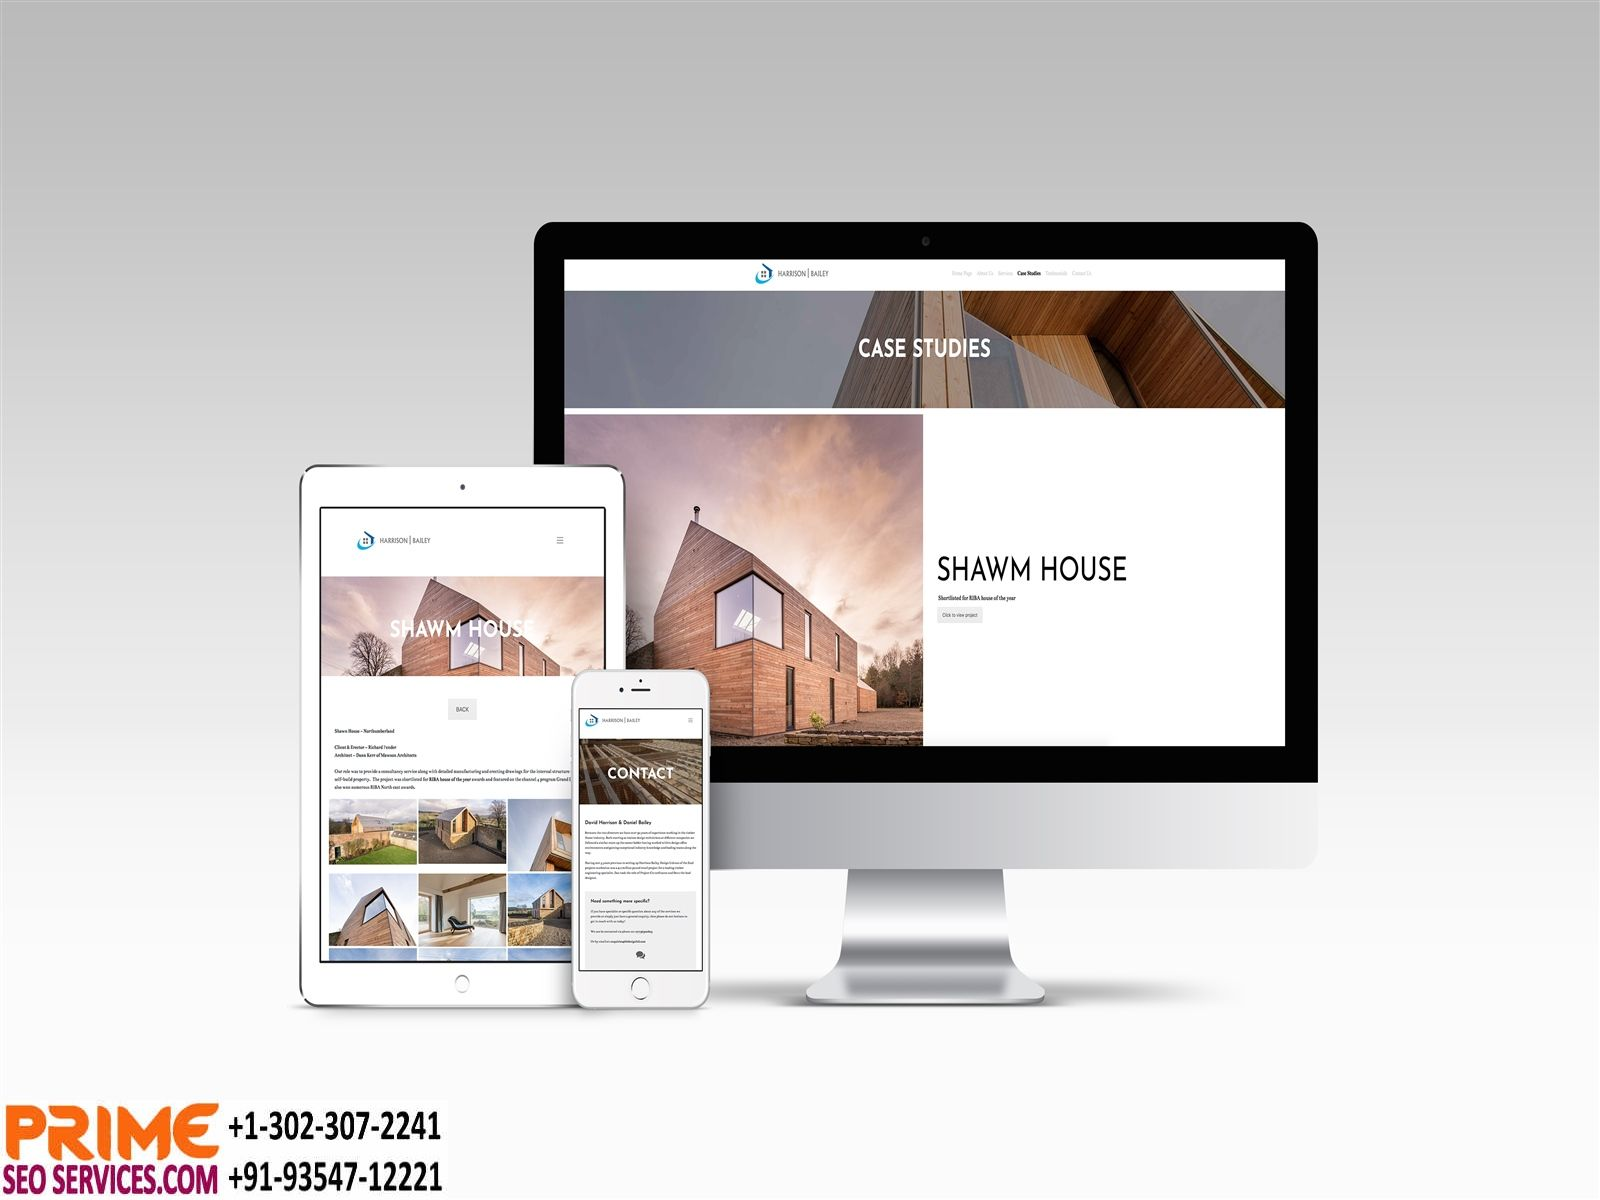 Web Design Gurgaon The Web Designers And Developers At Prime Seo Services Great Affordable Websites To Help In 2020 Website Design Wordpress Website Design Web Design